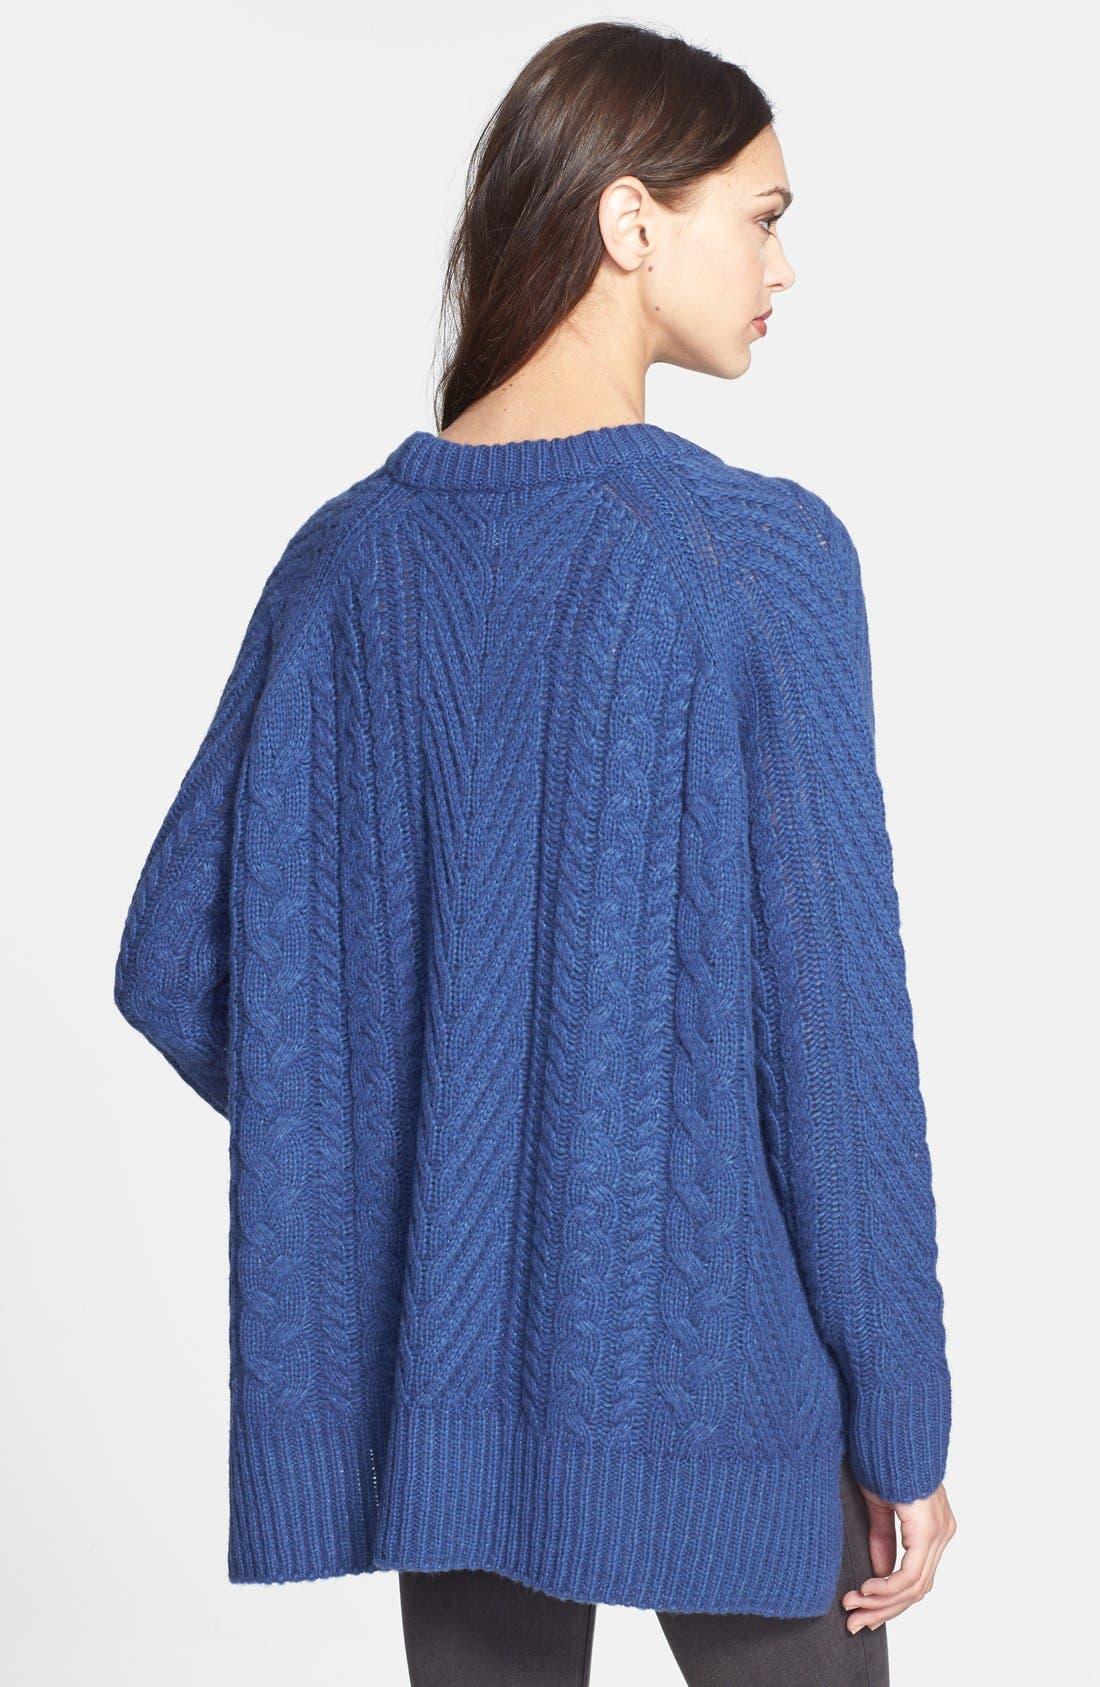 'James' Sweater,                             Alternate thumbnail 3, color,                             020